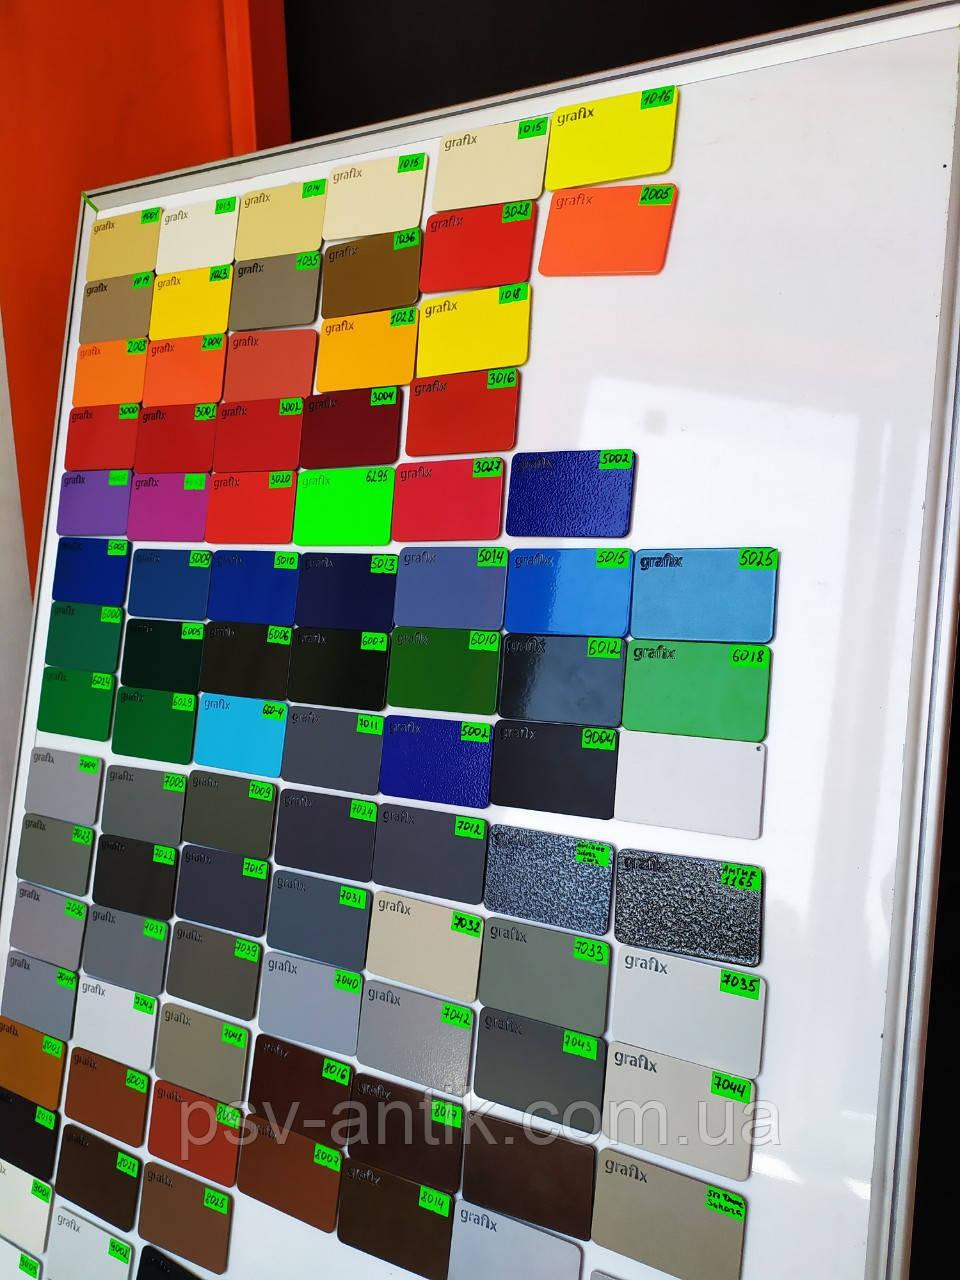 Порошковая краска глянцевая, полиэфирная, архитектурная, 1019